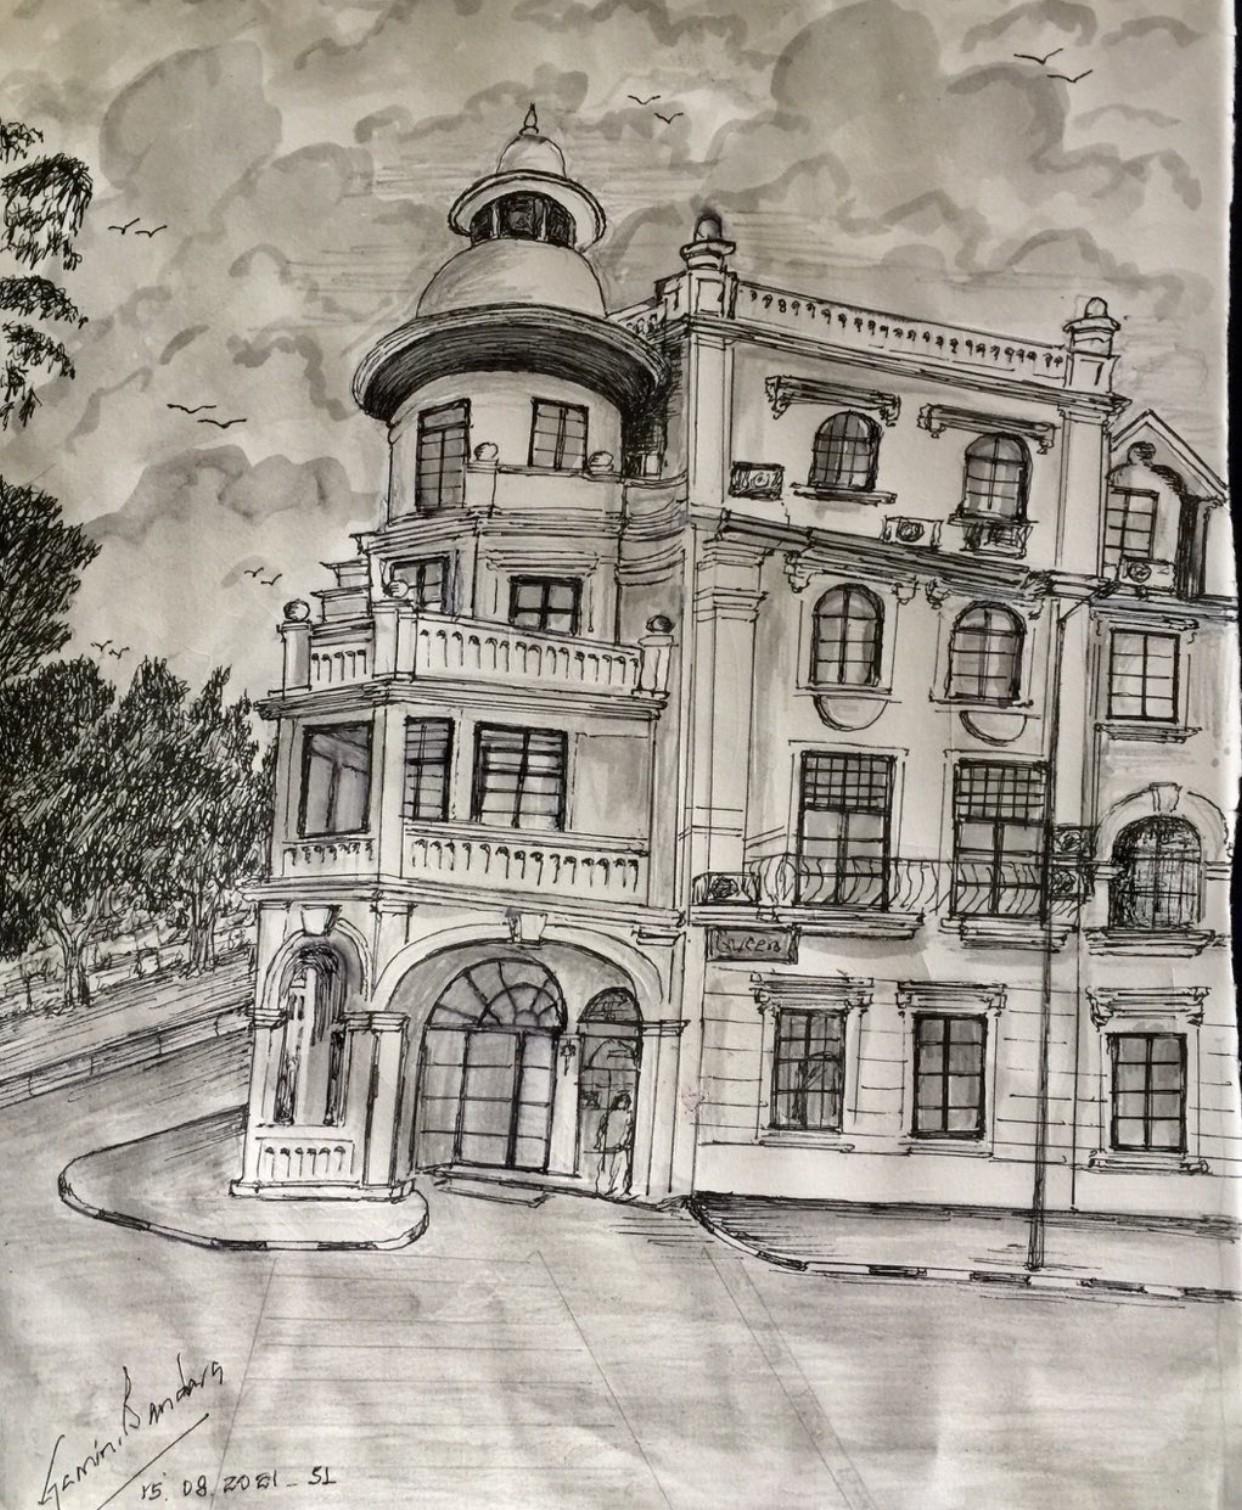 Famous Hotel in Kandy, Srilanka by Gamini Meegalla